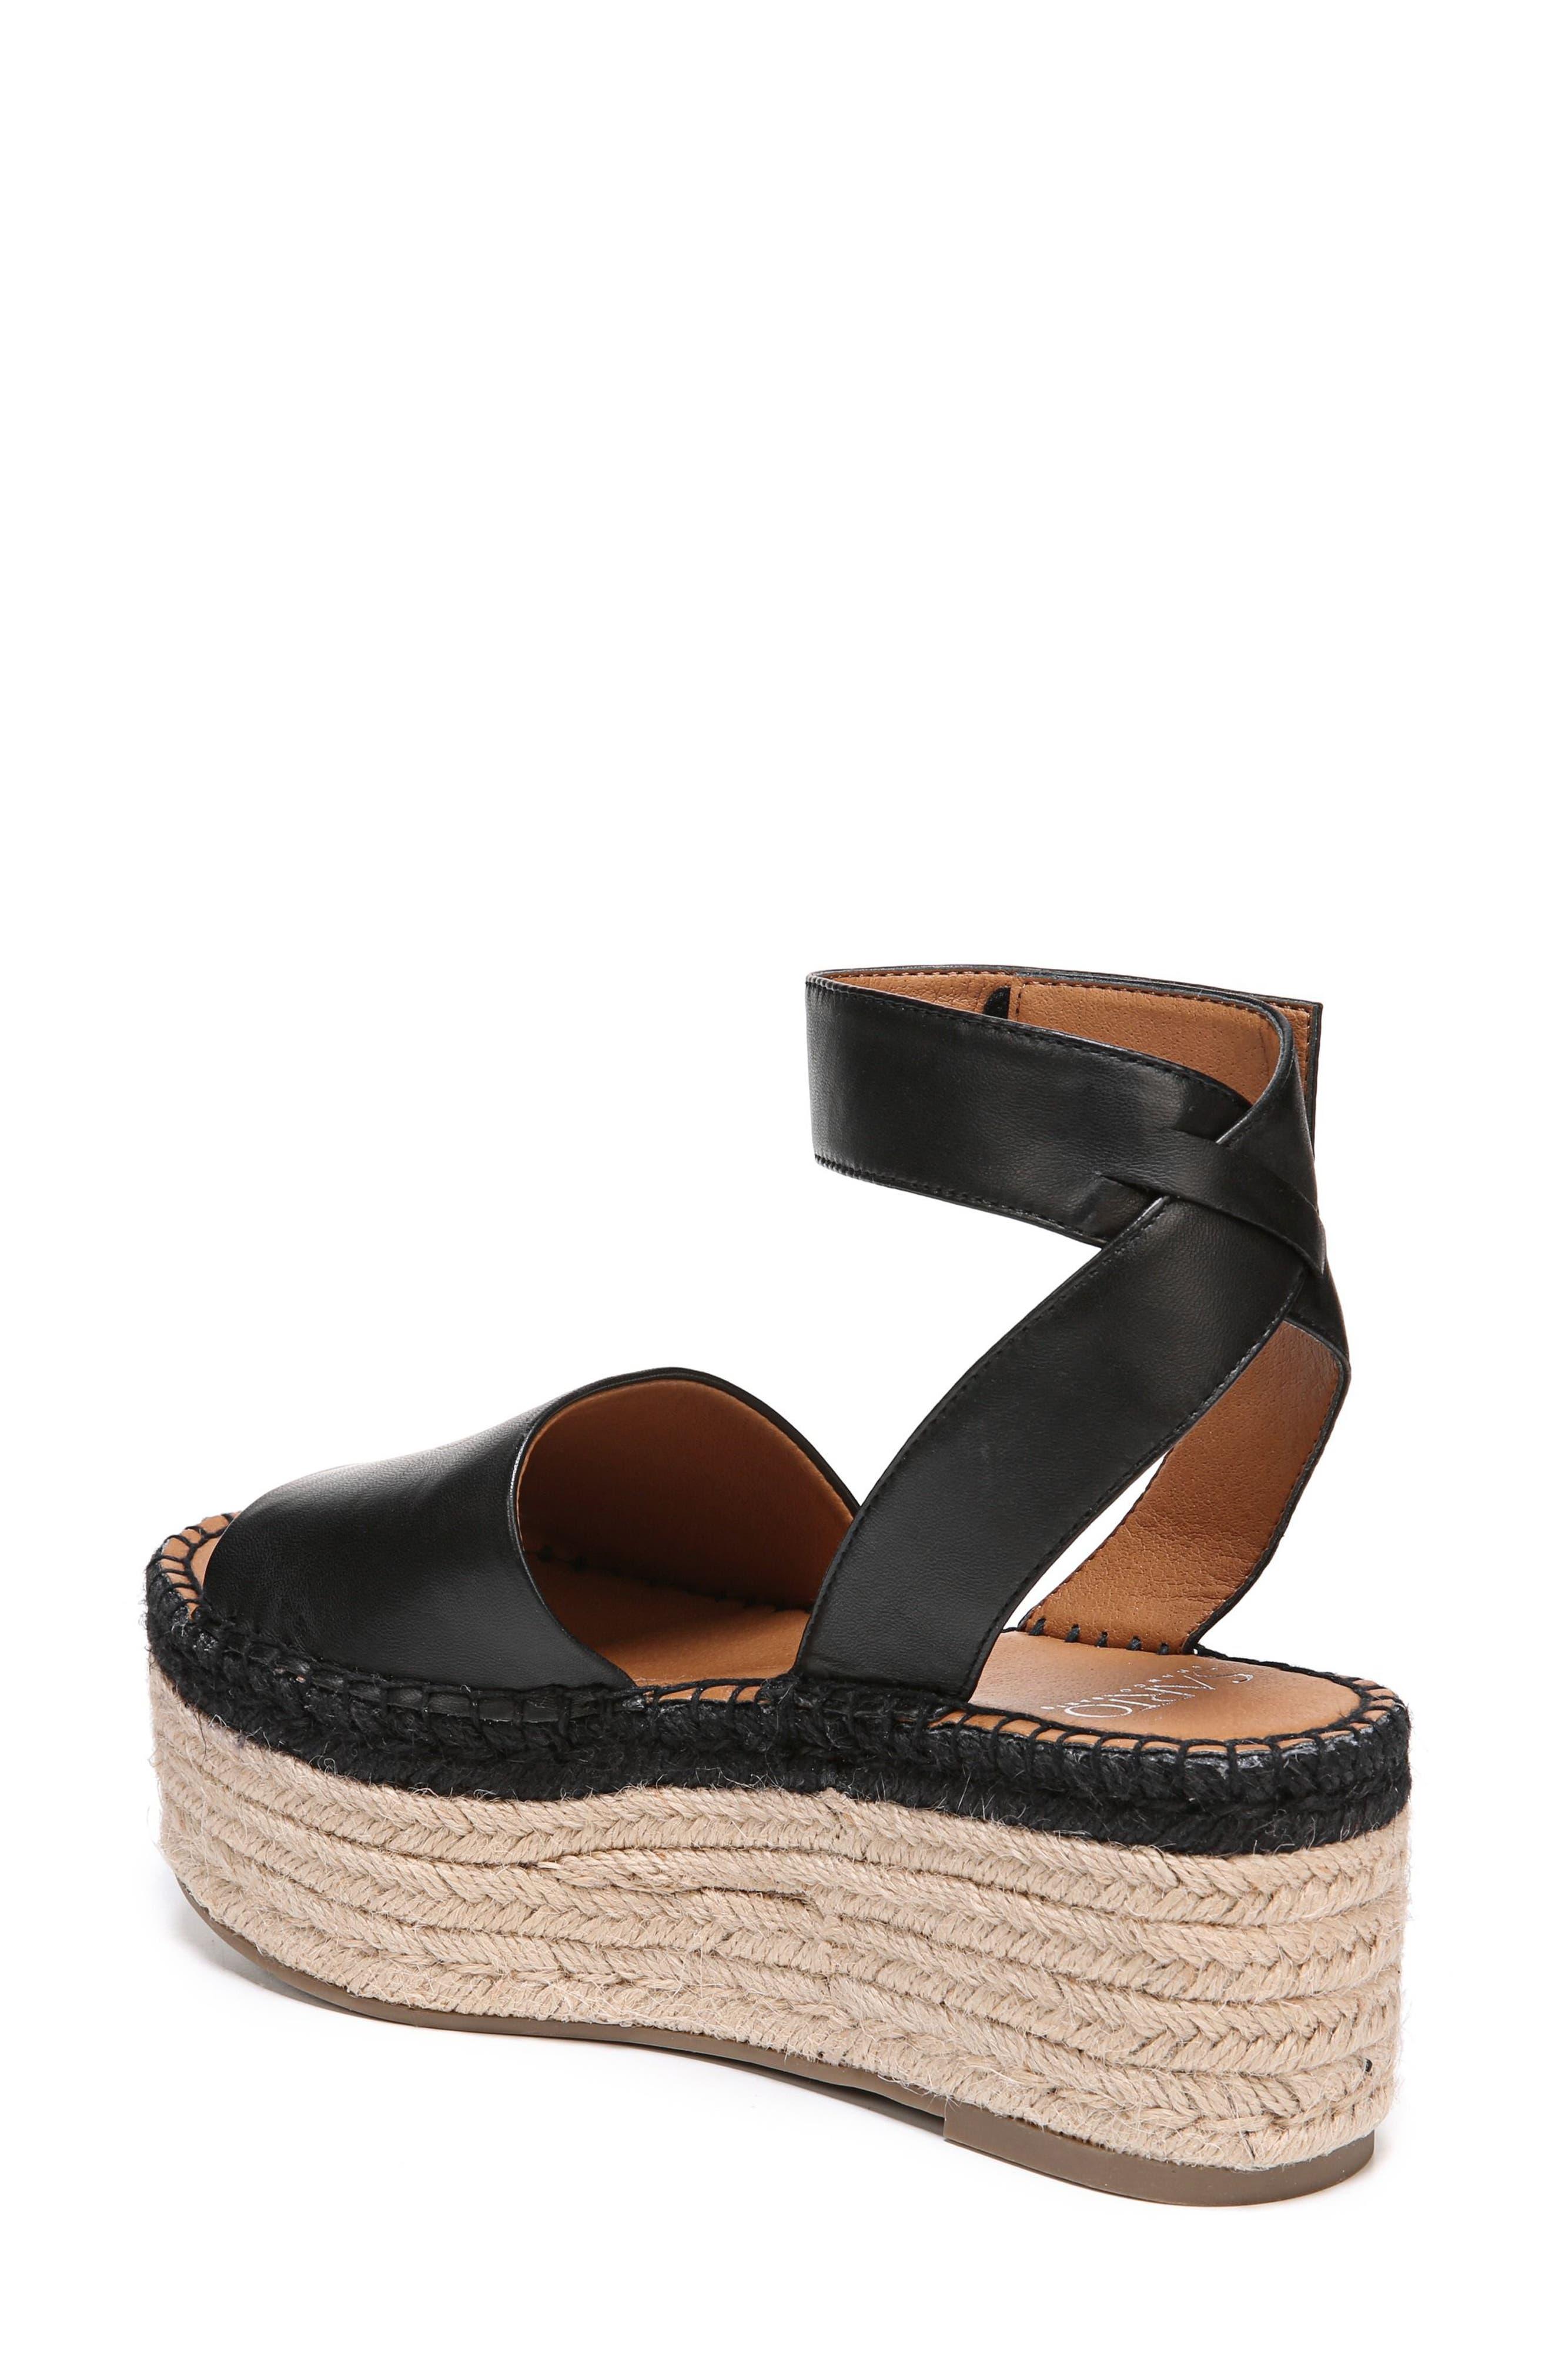 Maisi Platform Espadrille Sandal,                             Alternate thumbnail 7, color,                             BLACK LEATHER